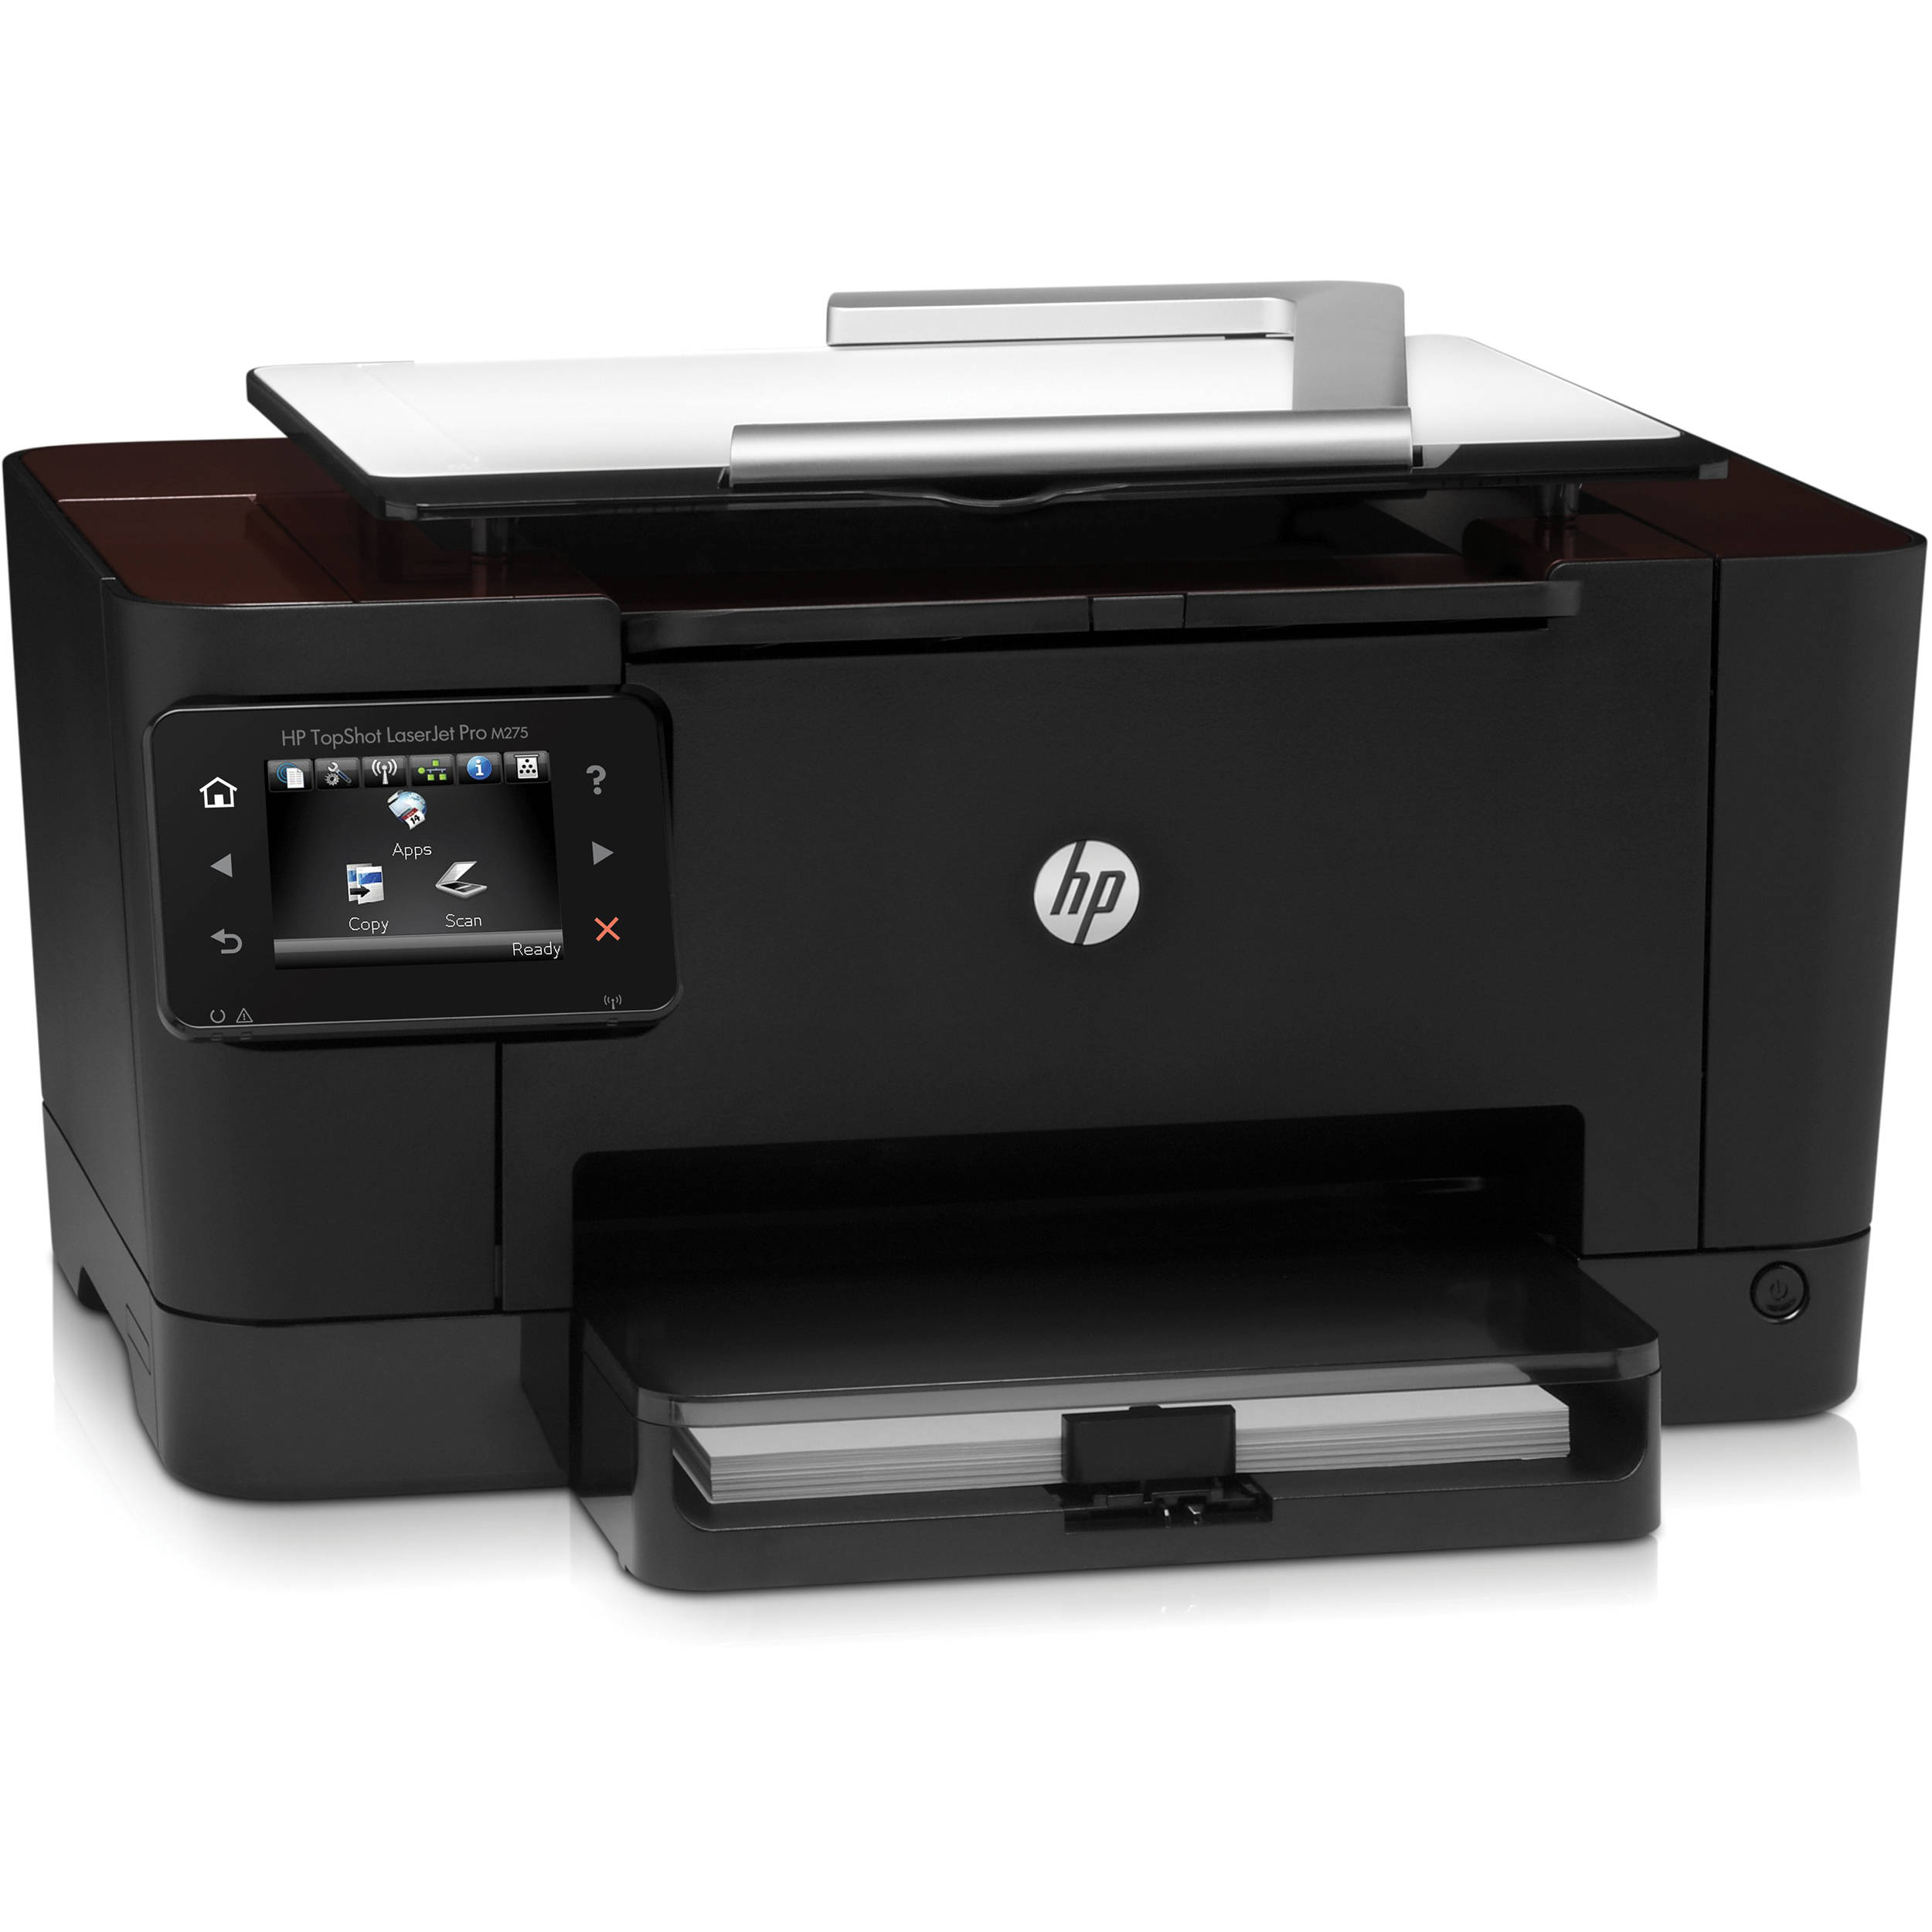 d5ca57e0f80e HP M275 TopShot LaserJet Pro Color Multifunction Printer CF040A